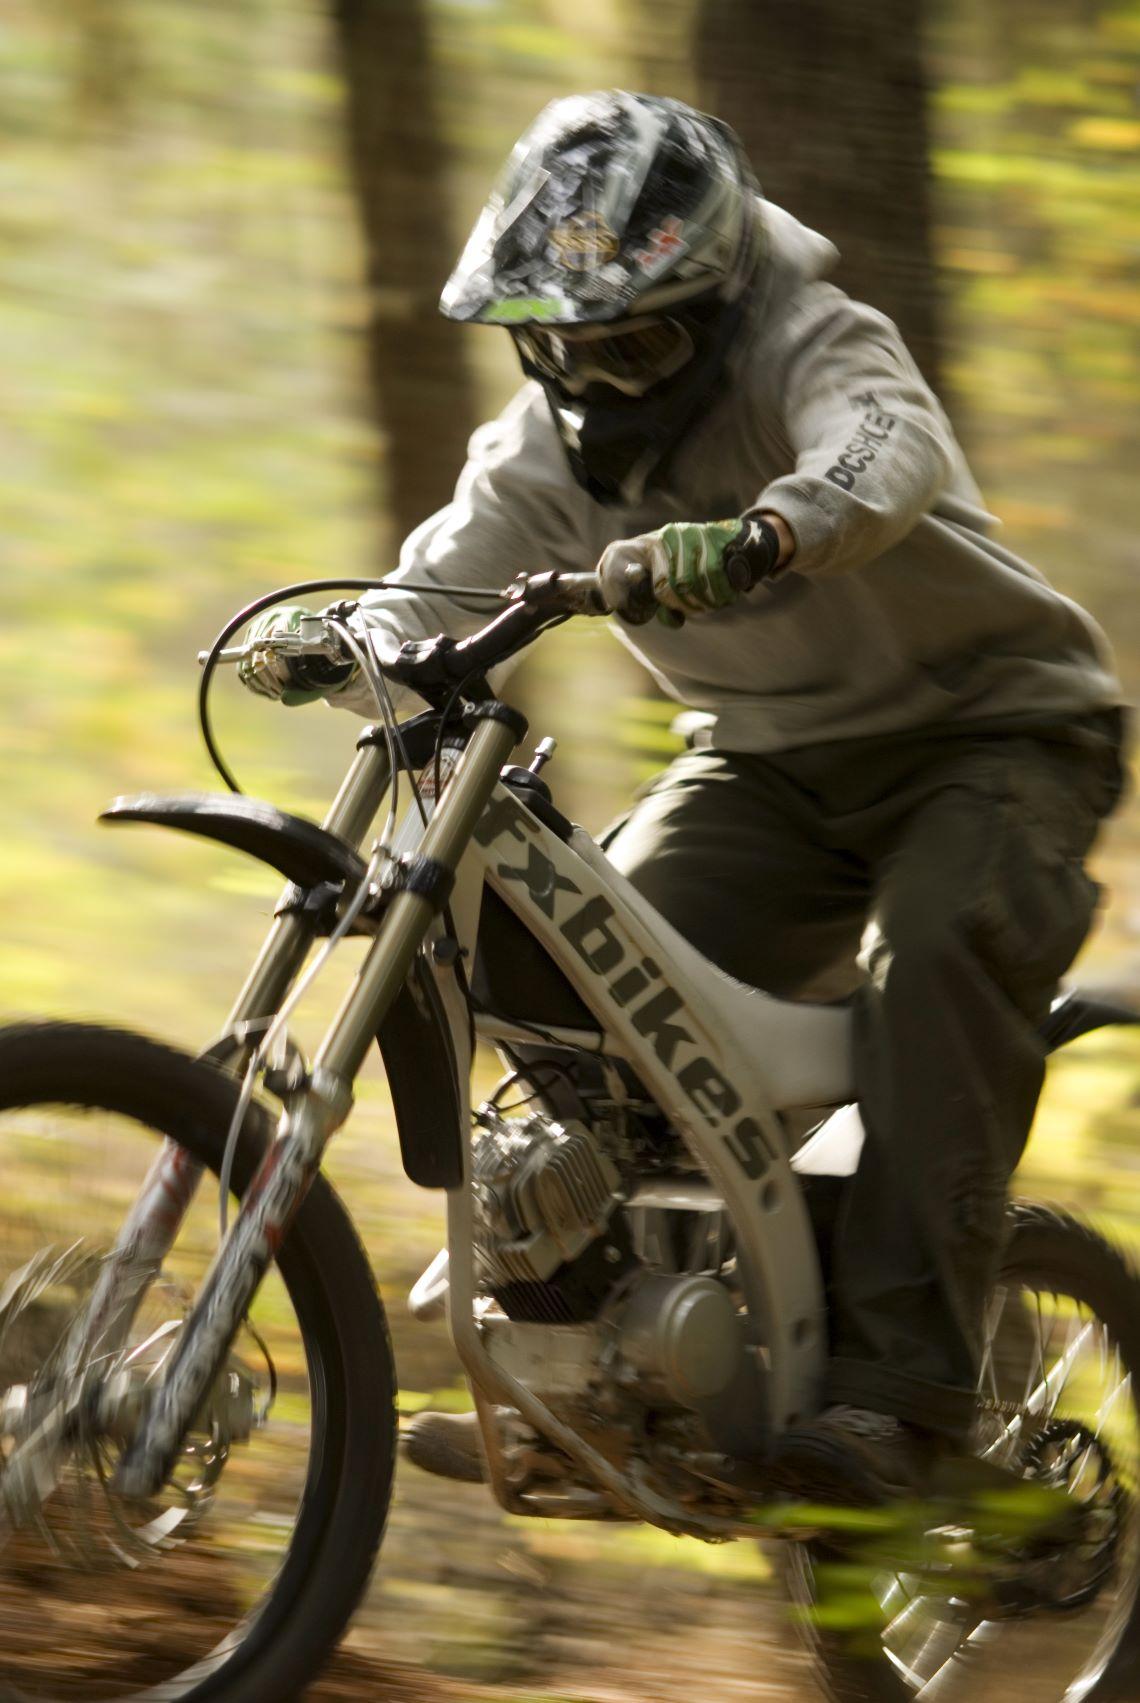 Light-bike-FX-Mountain-Moto